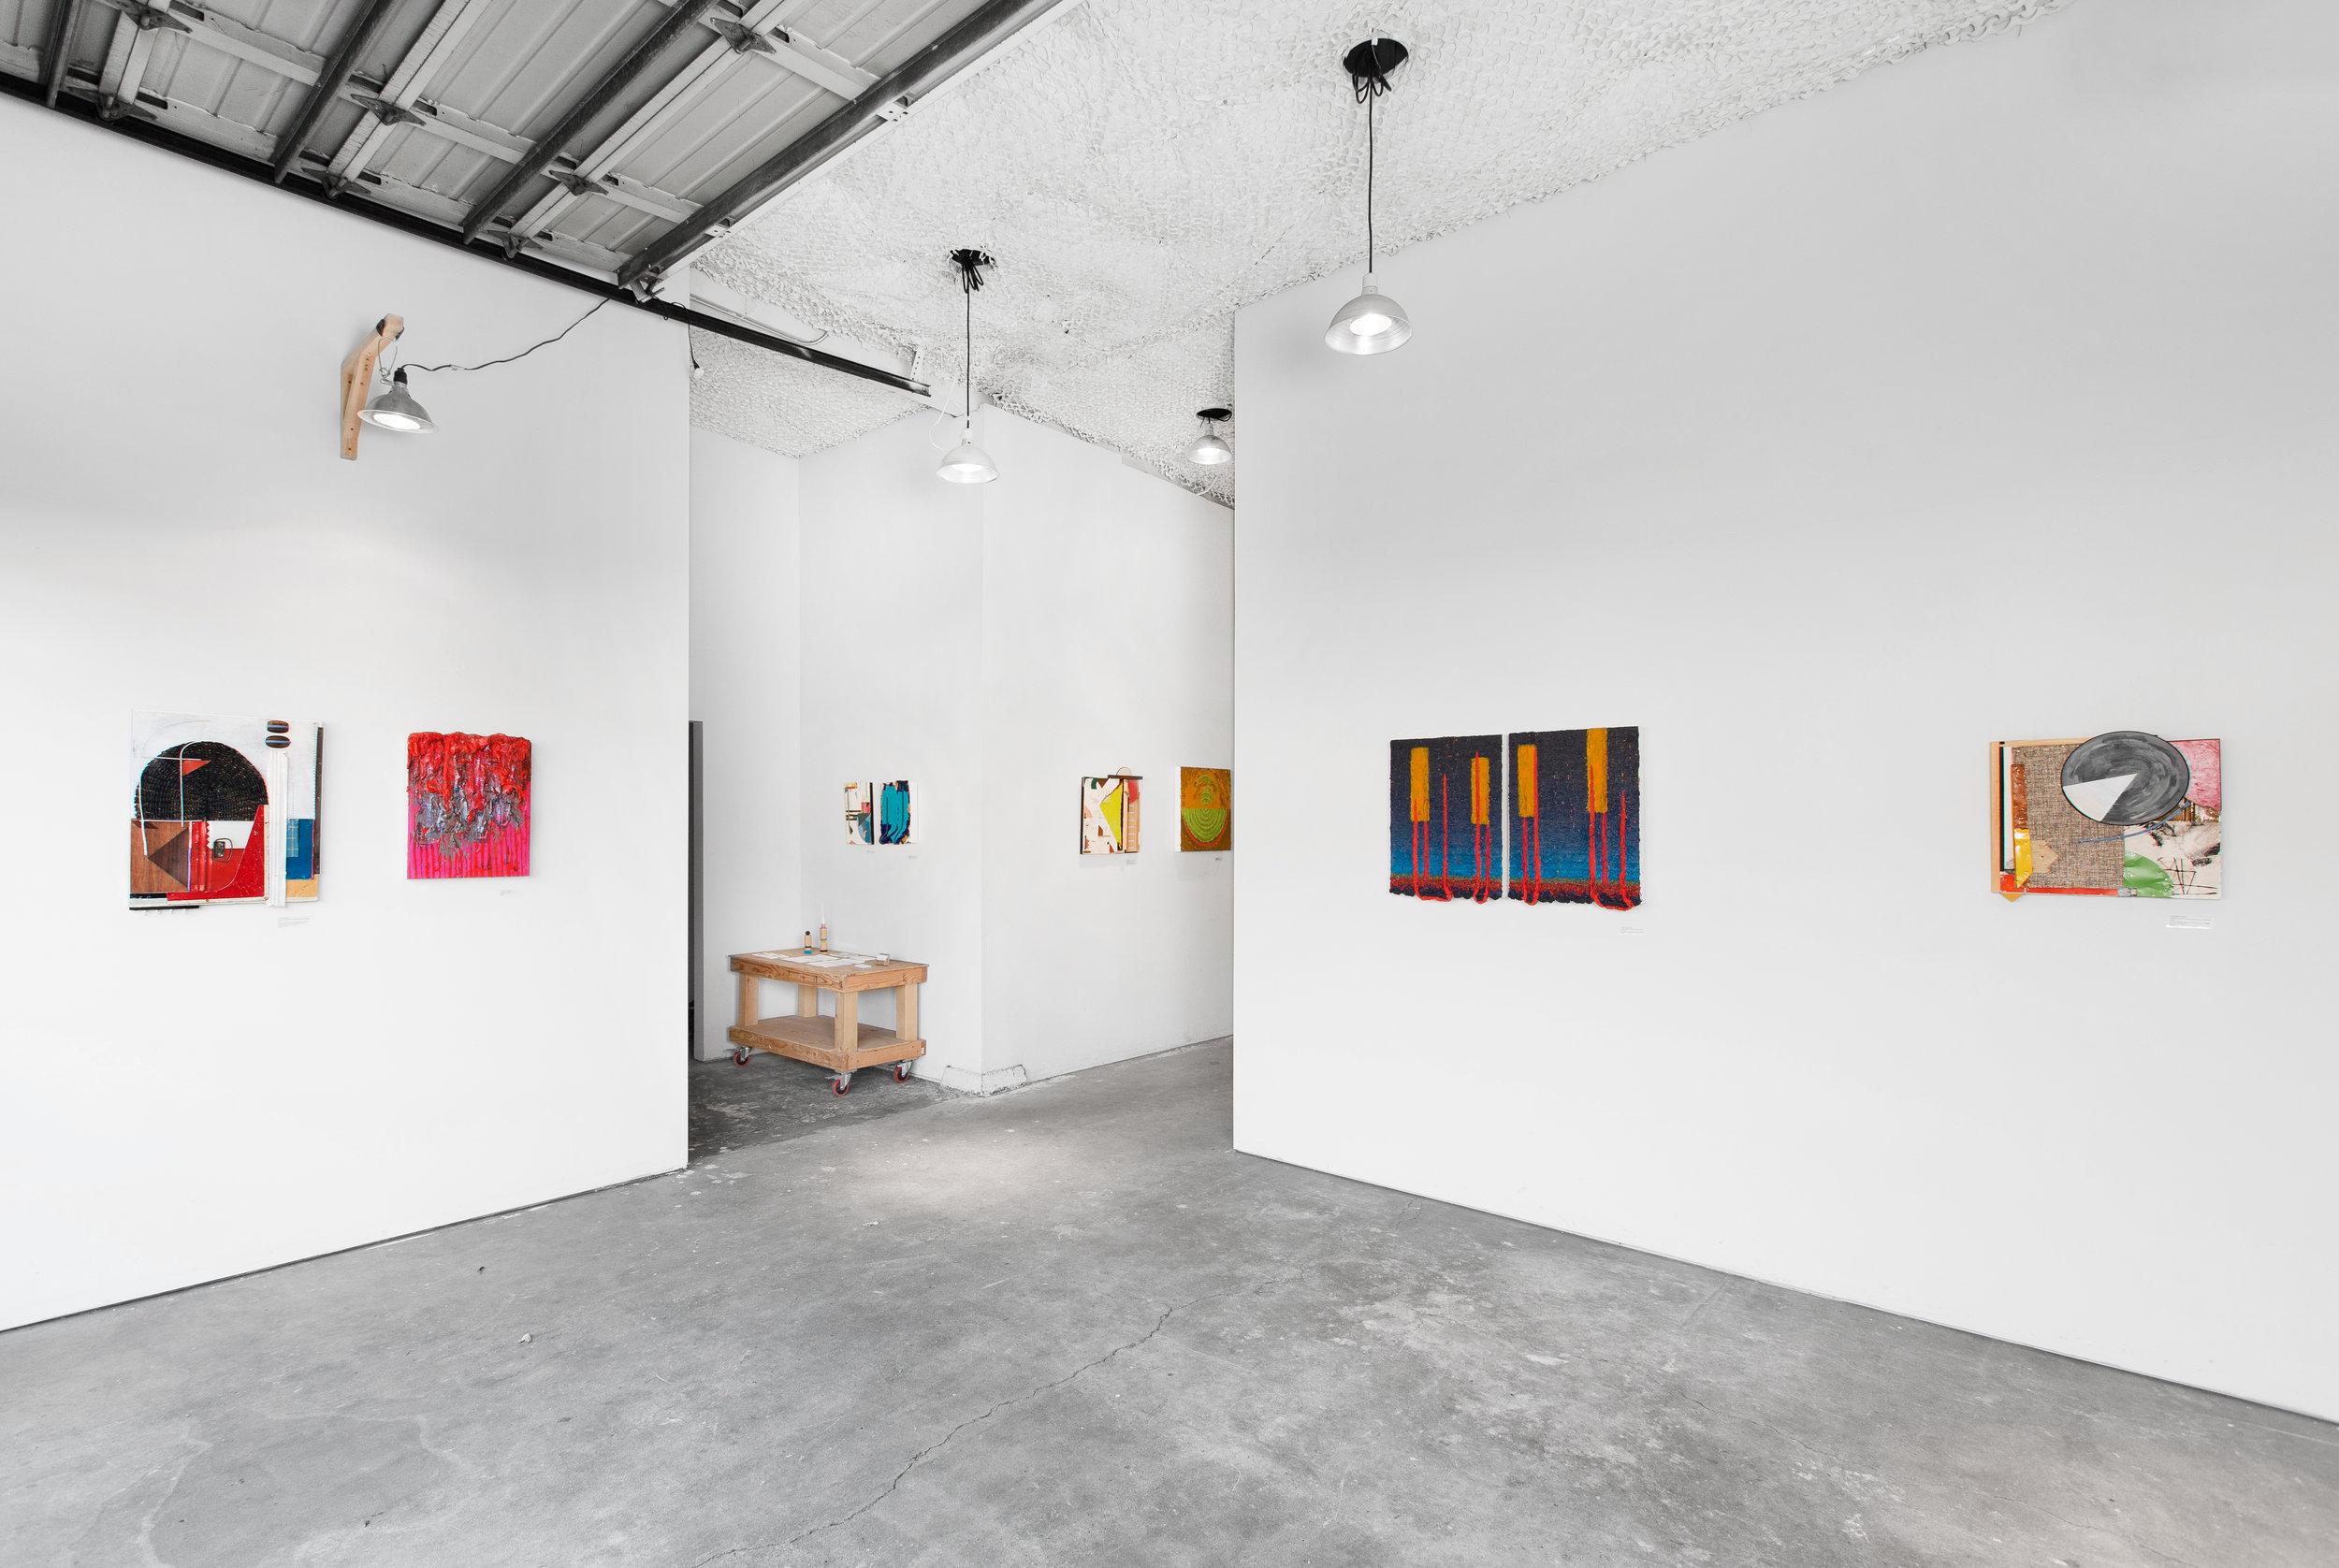 Installation shot by Rafael Soldi at Plank Gallery